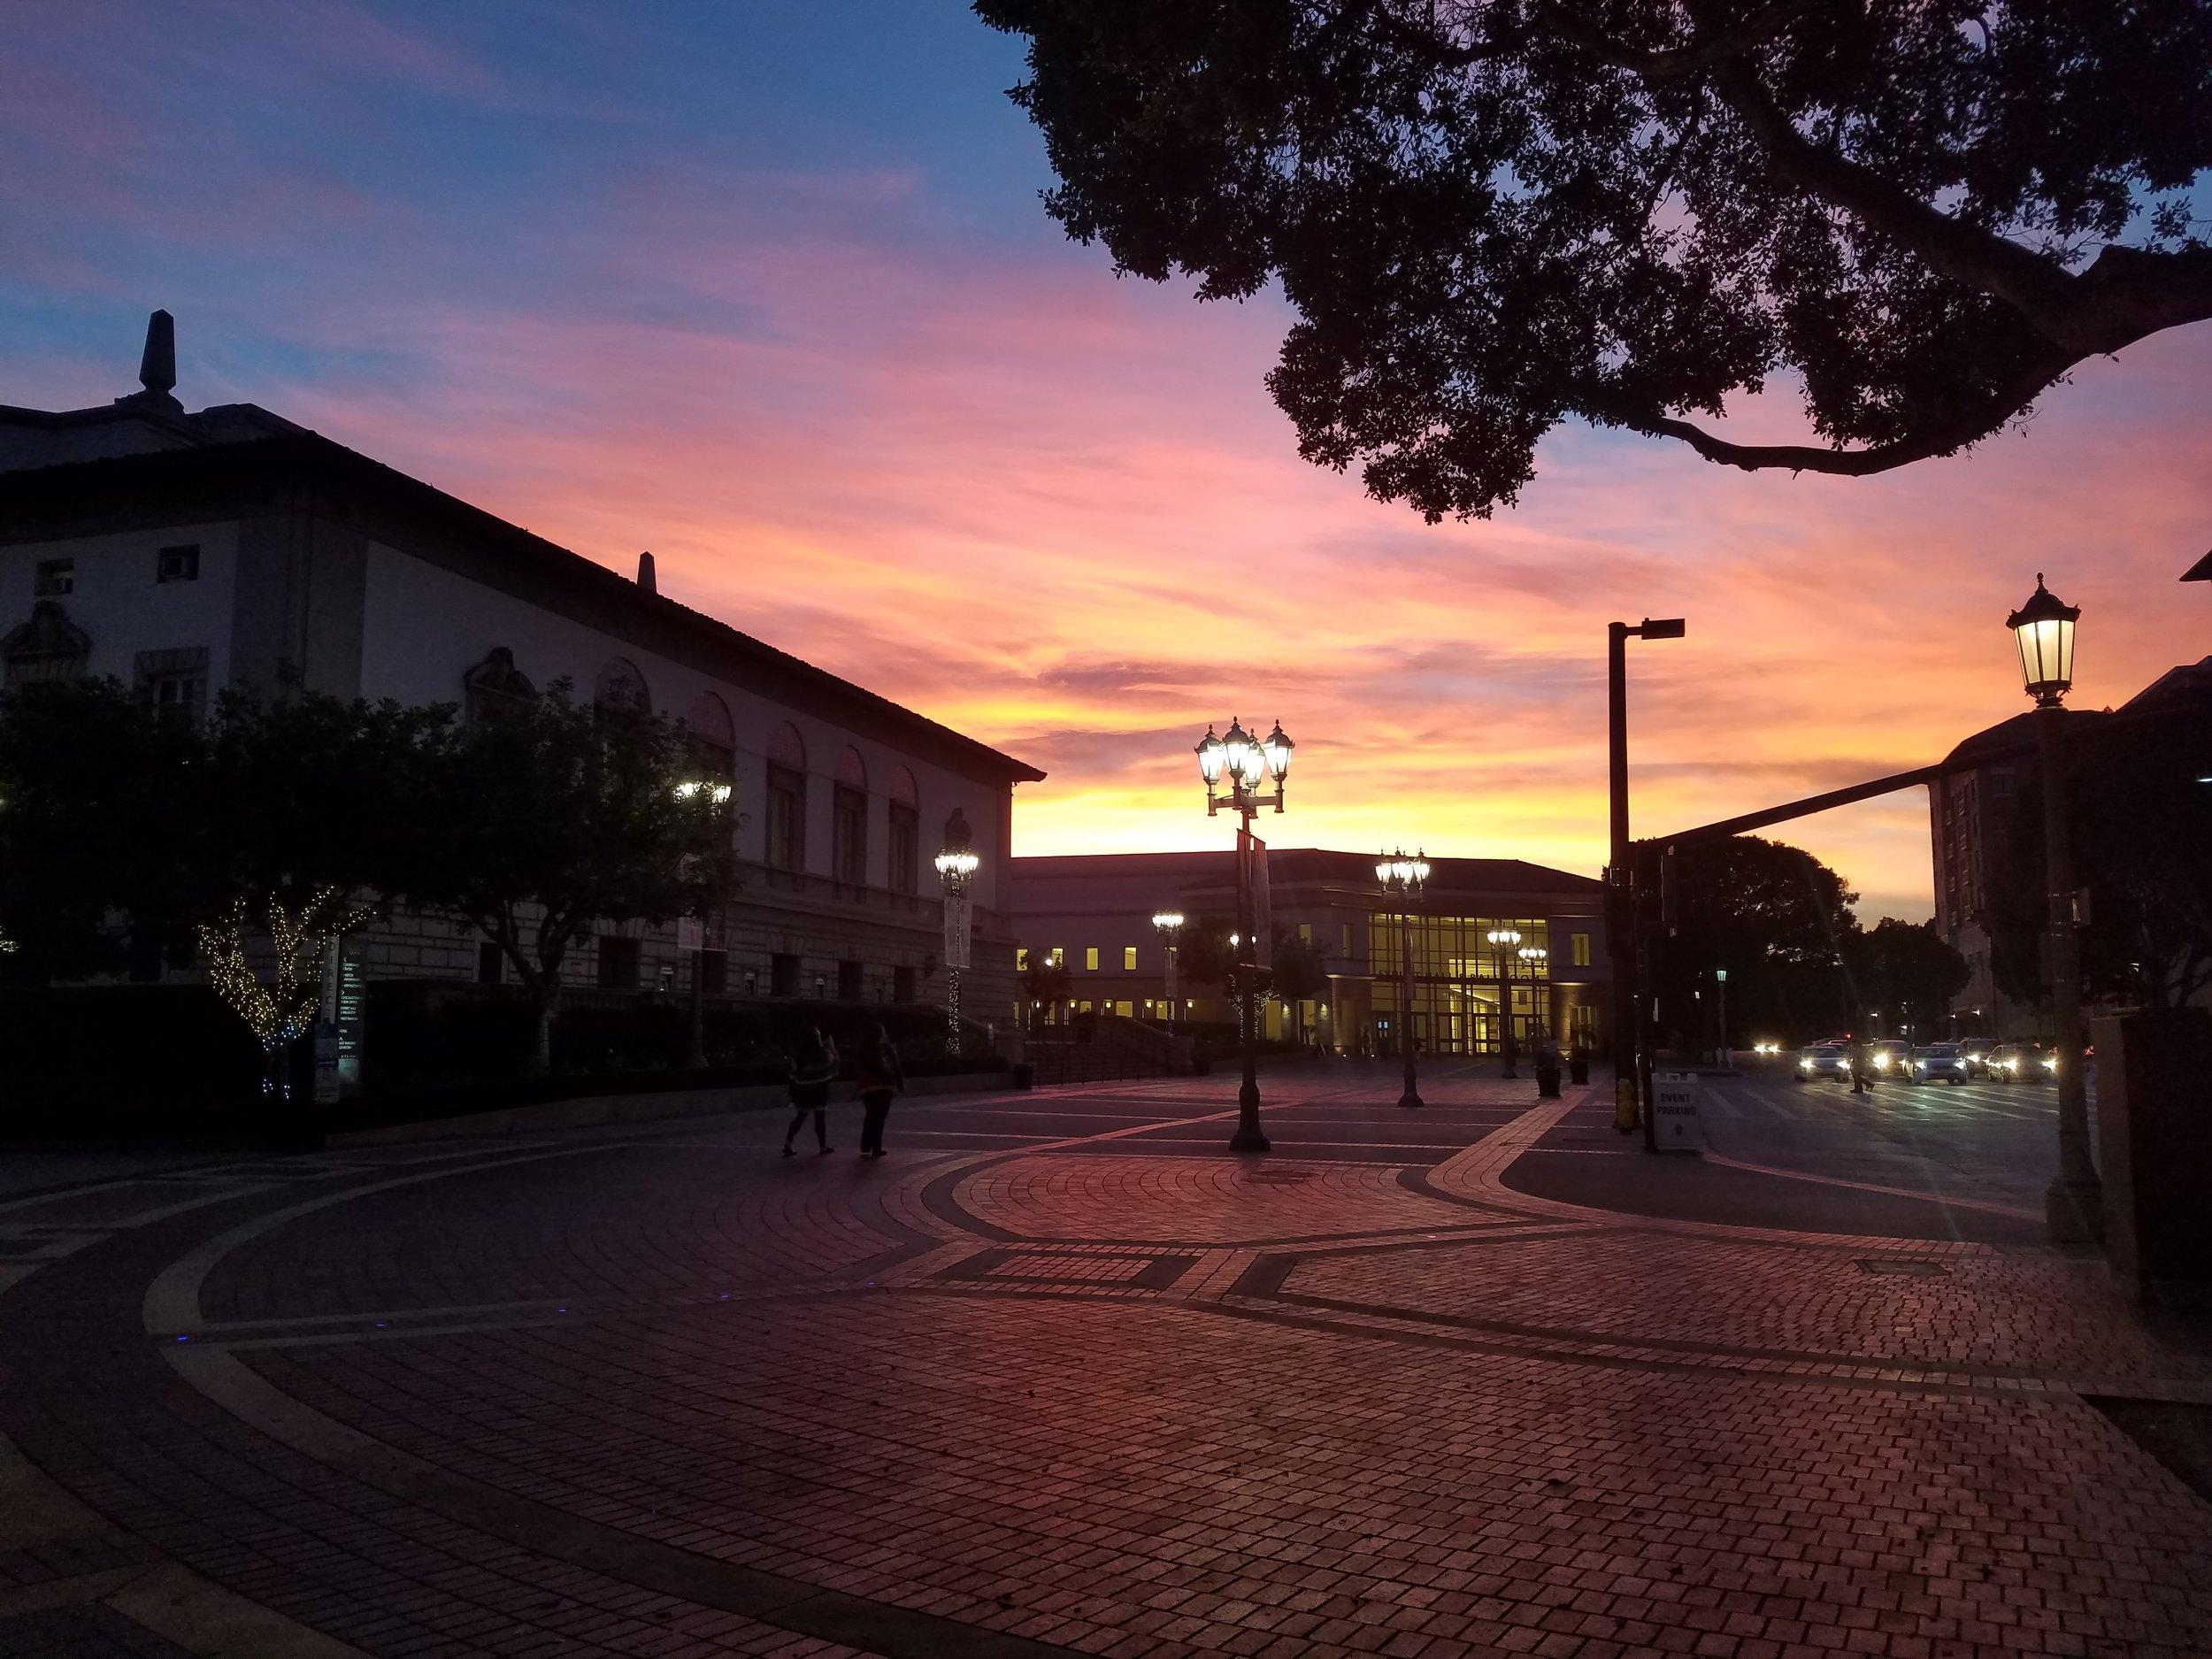 Catching Sunset in Old Town, Pasadena, California